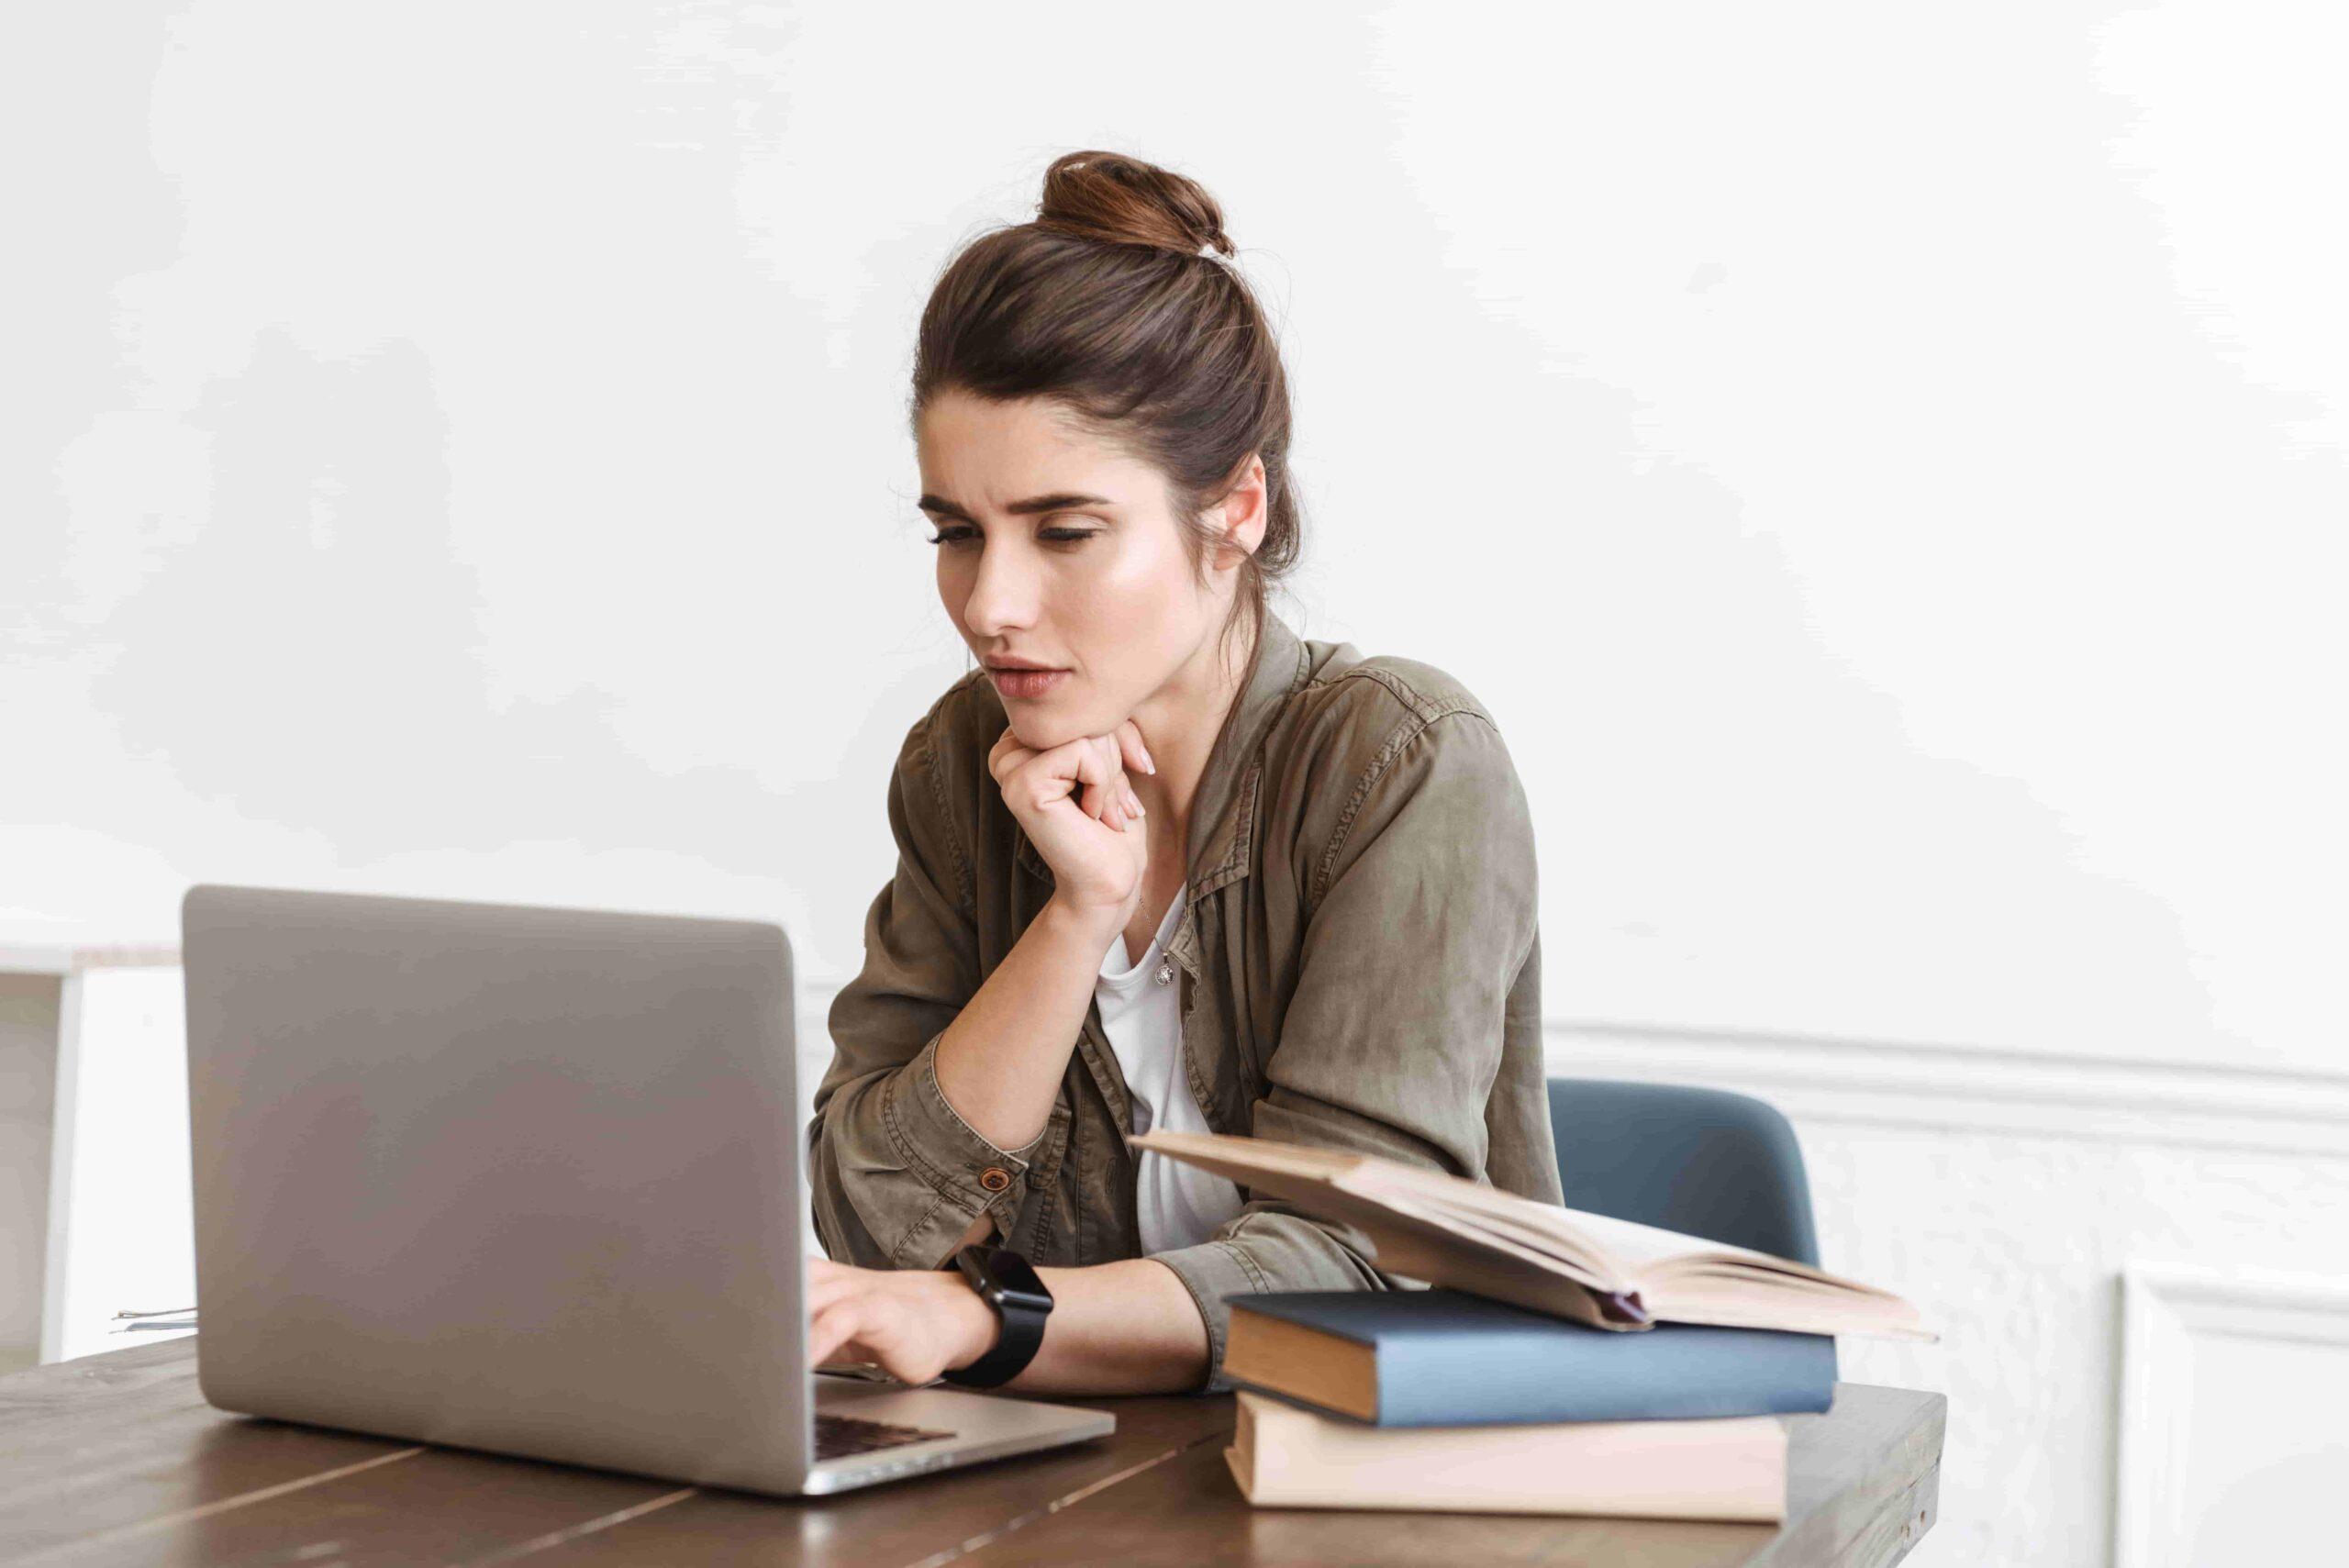 10 Best Laptop For Me Quiz In 2021